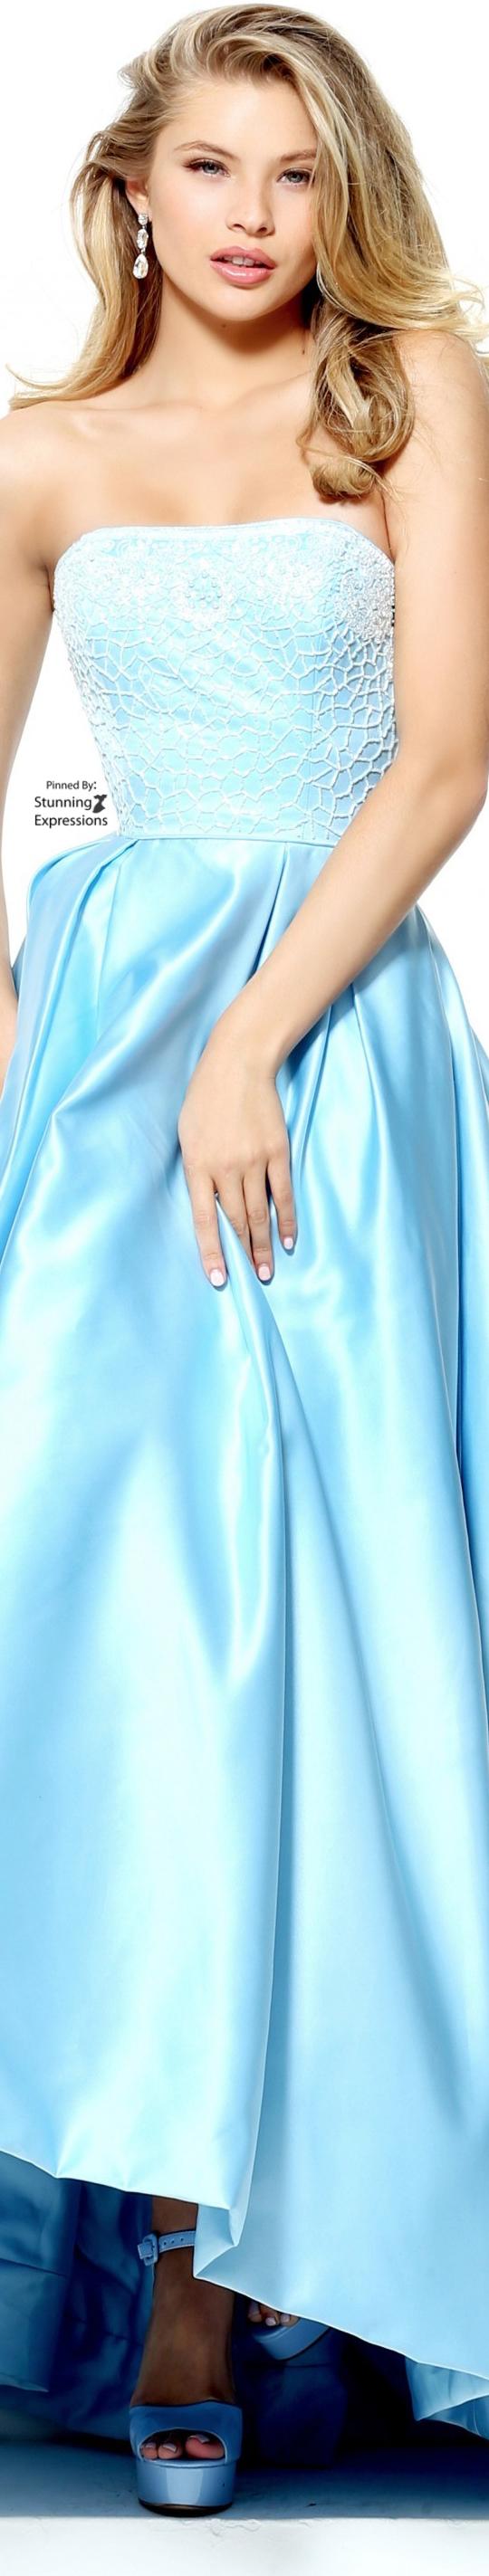 Sherri Hill | MISS MILLIONAIRESS & CO.™ | Pinterest | Tiffany ...